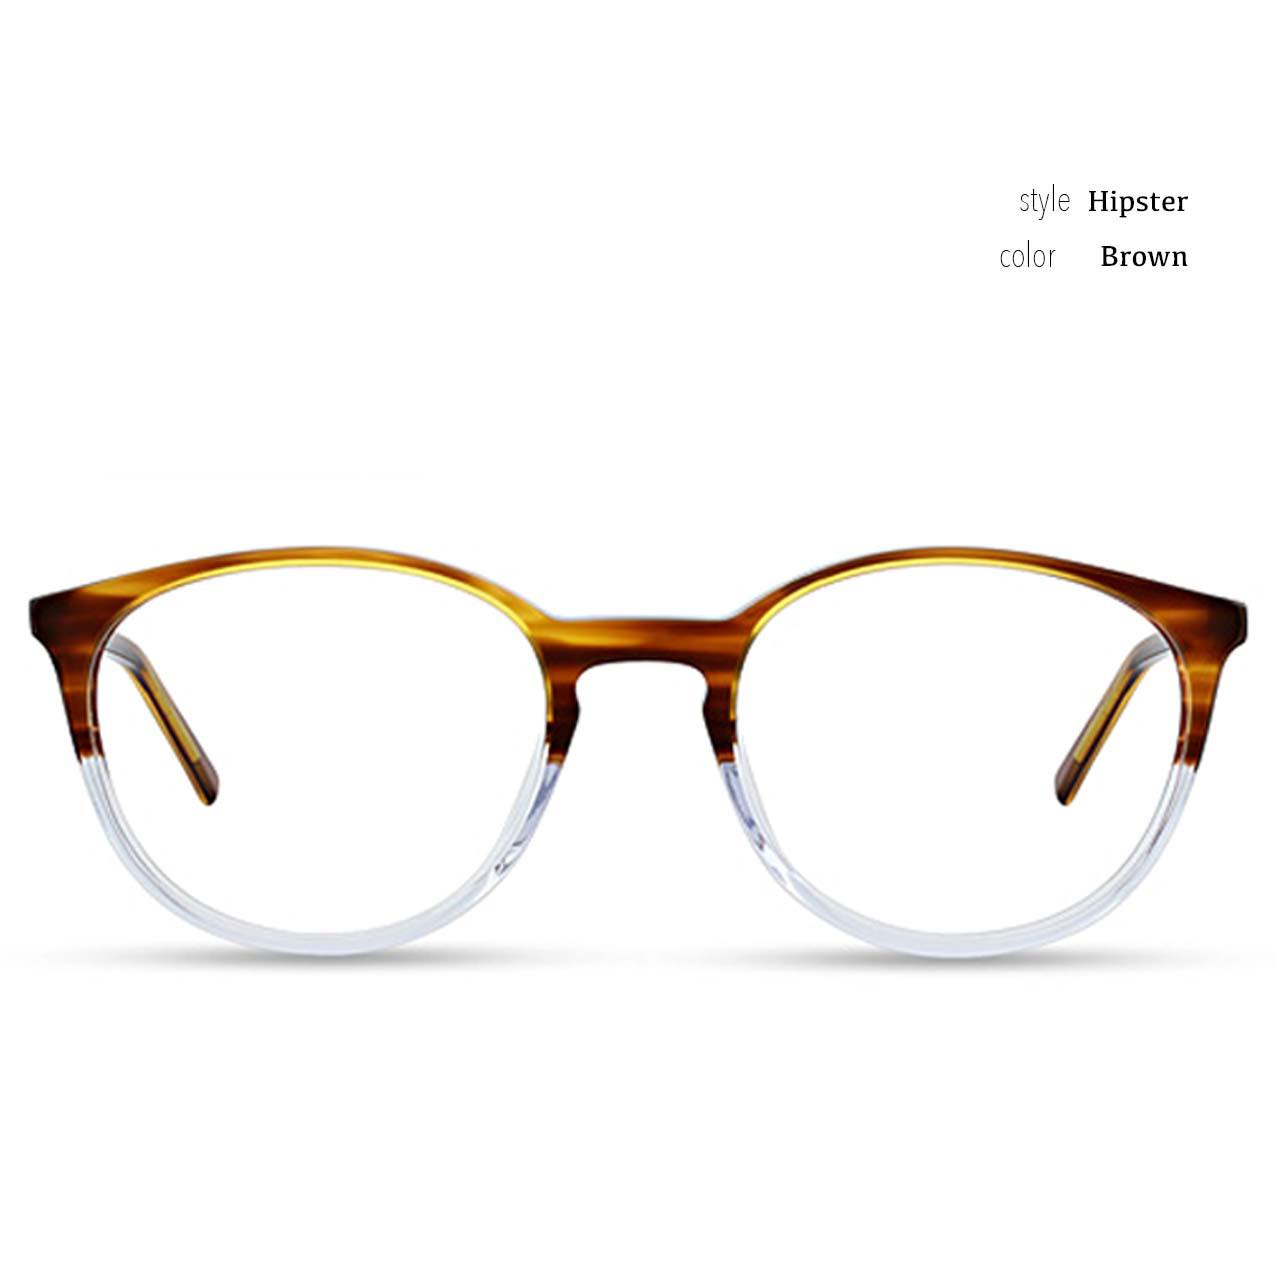 GEEK Eyewear Style Hipster Brown